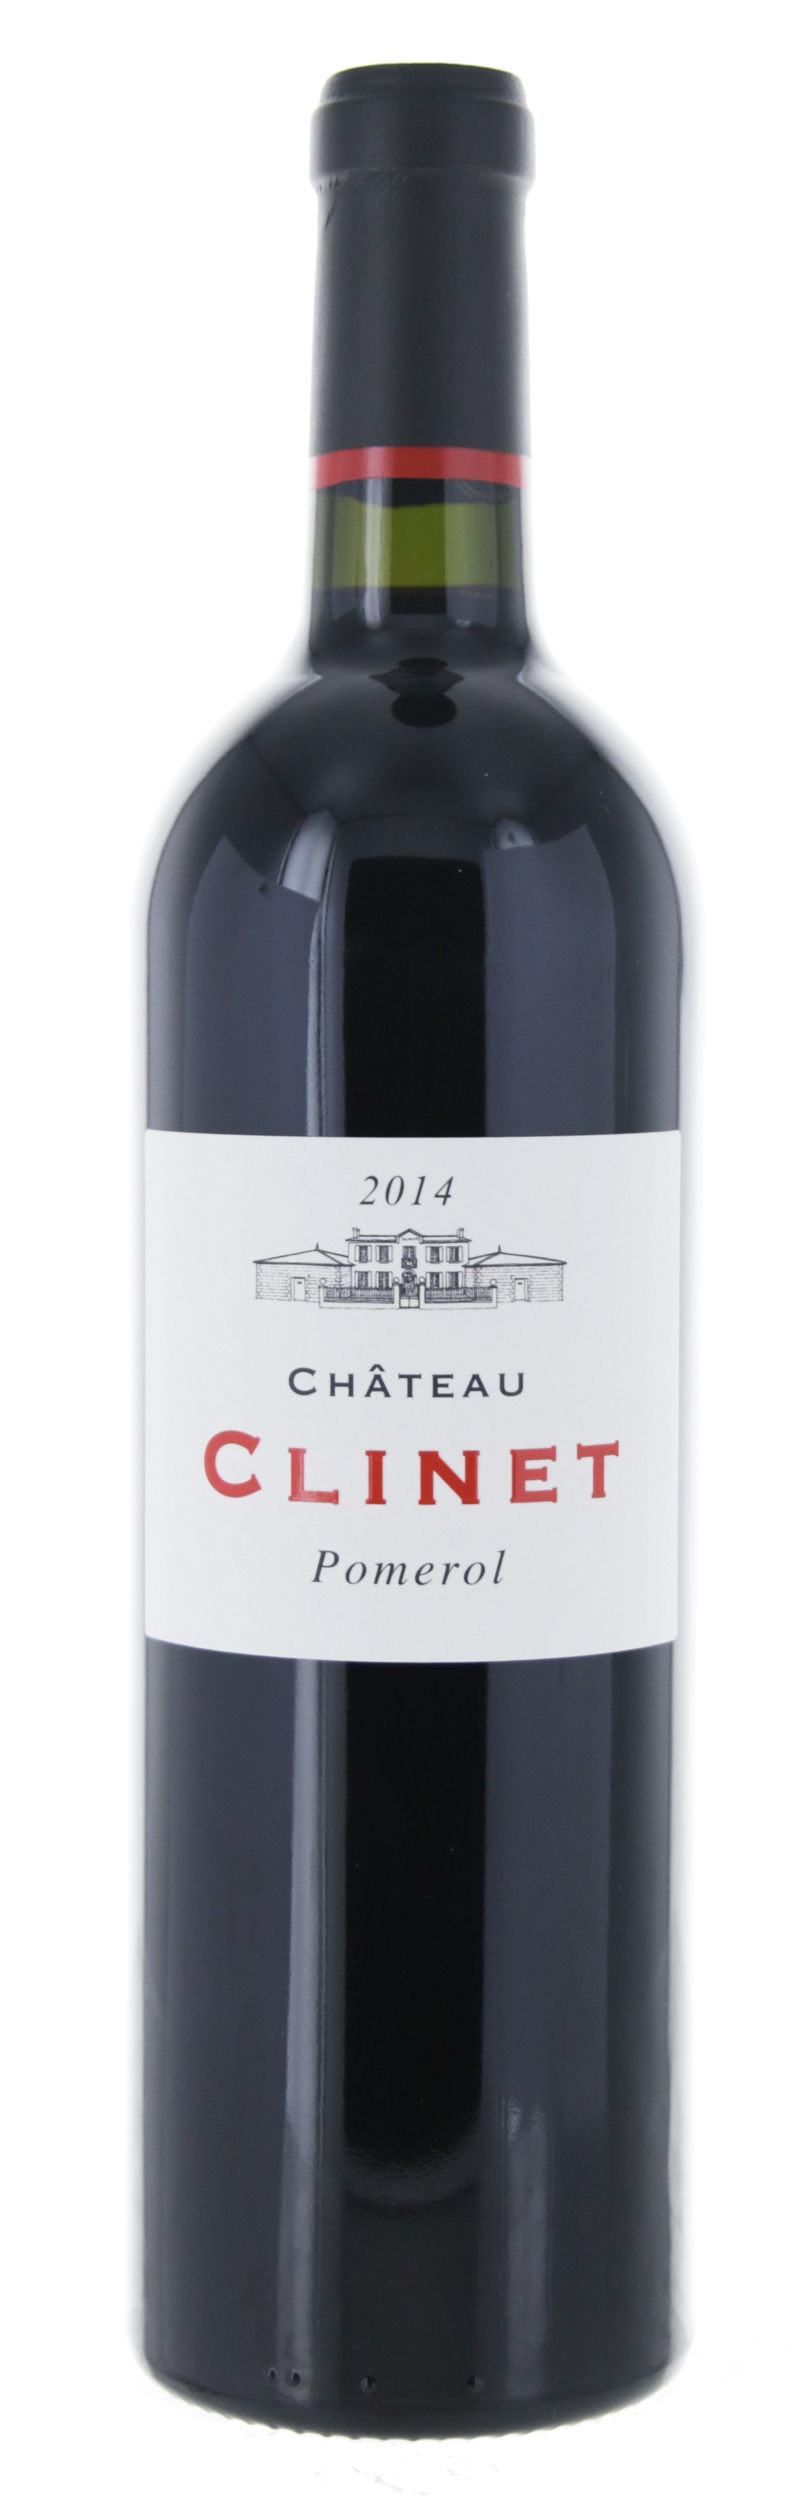 Pomerol - Château Clinet - 2014